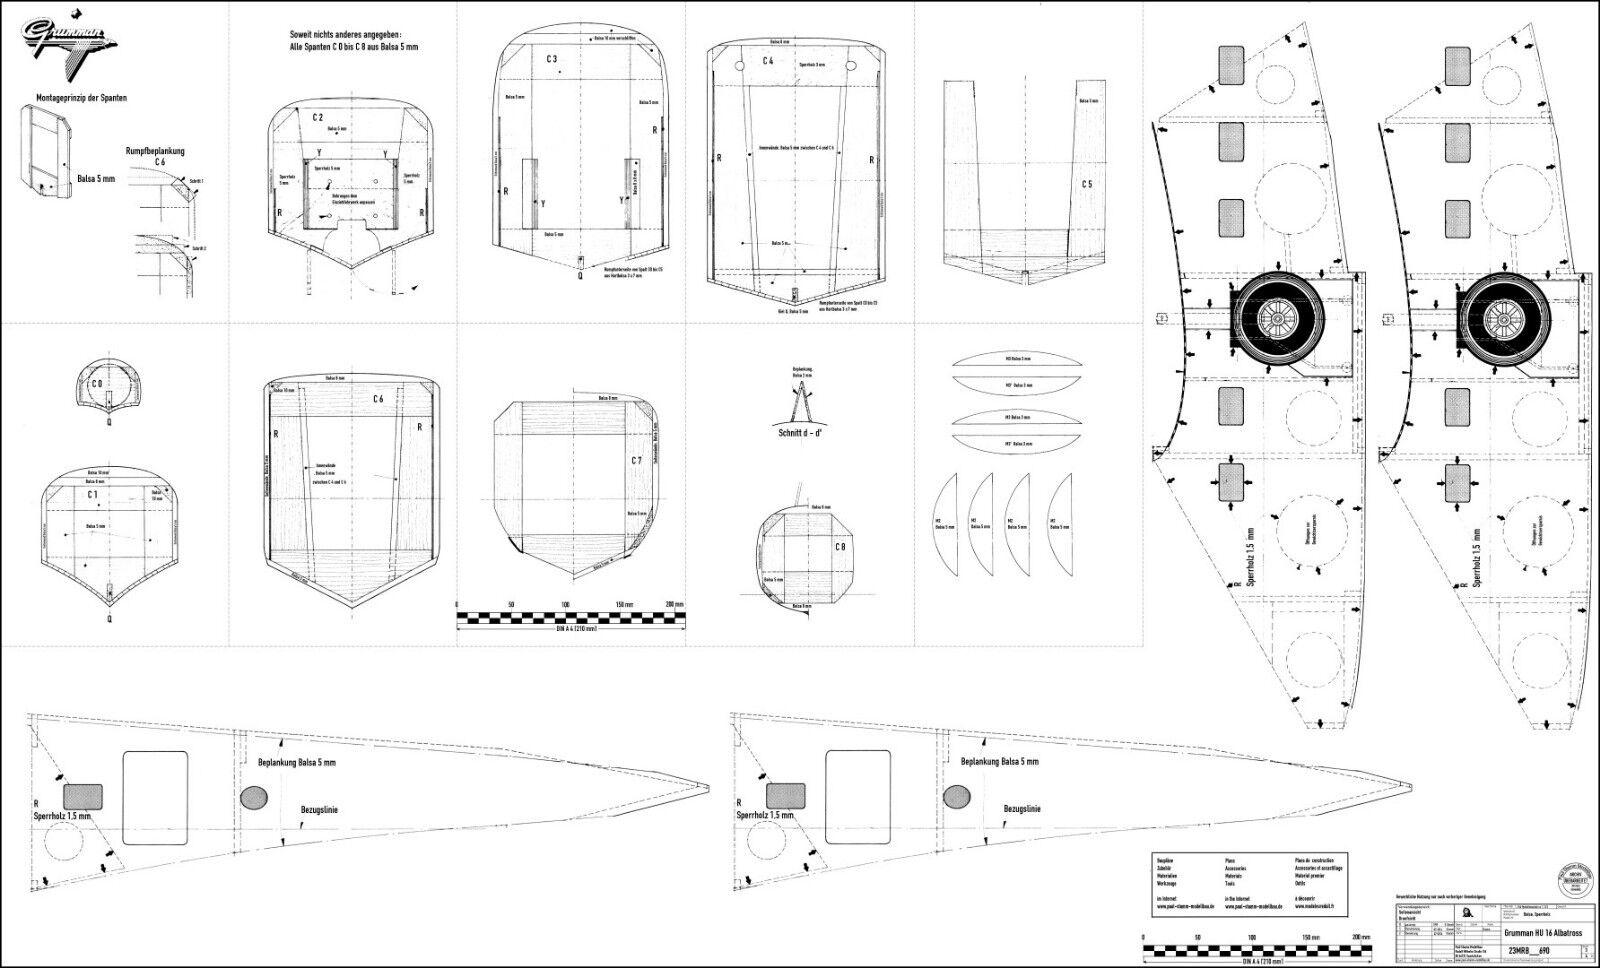 Wasserflugzeug Modellbauplan Amphibienflugzeug GRUMMAN HU-16 ALBATROSS